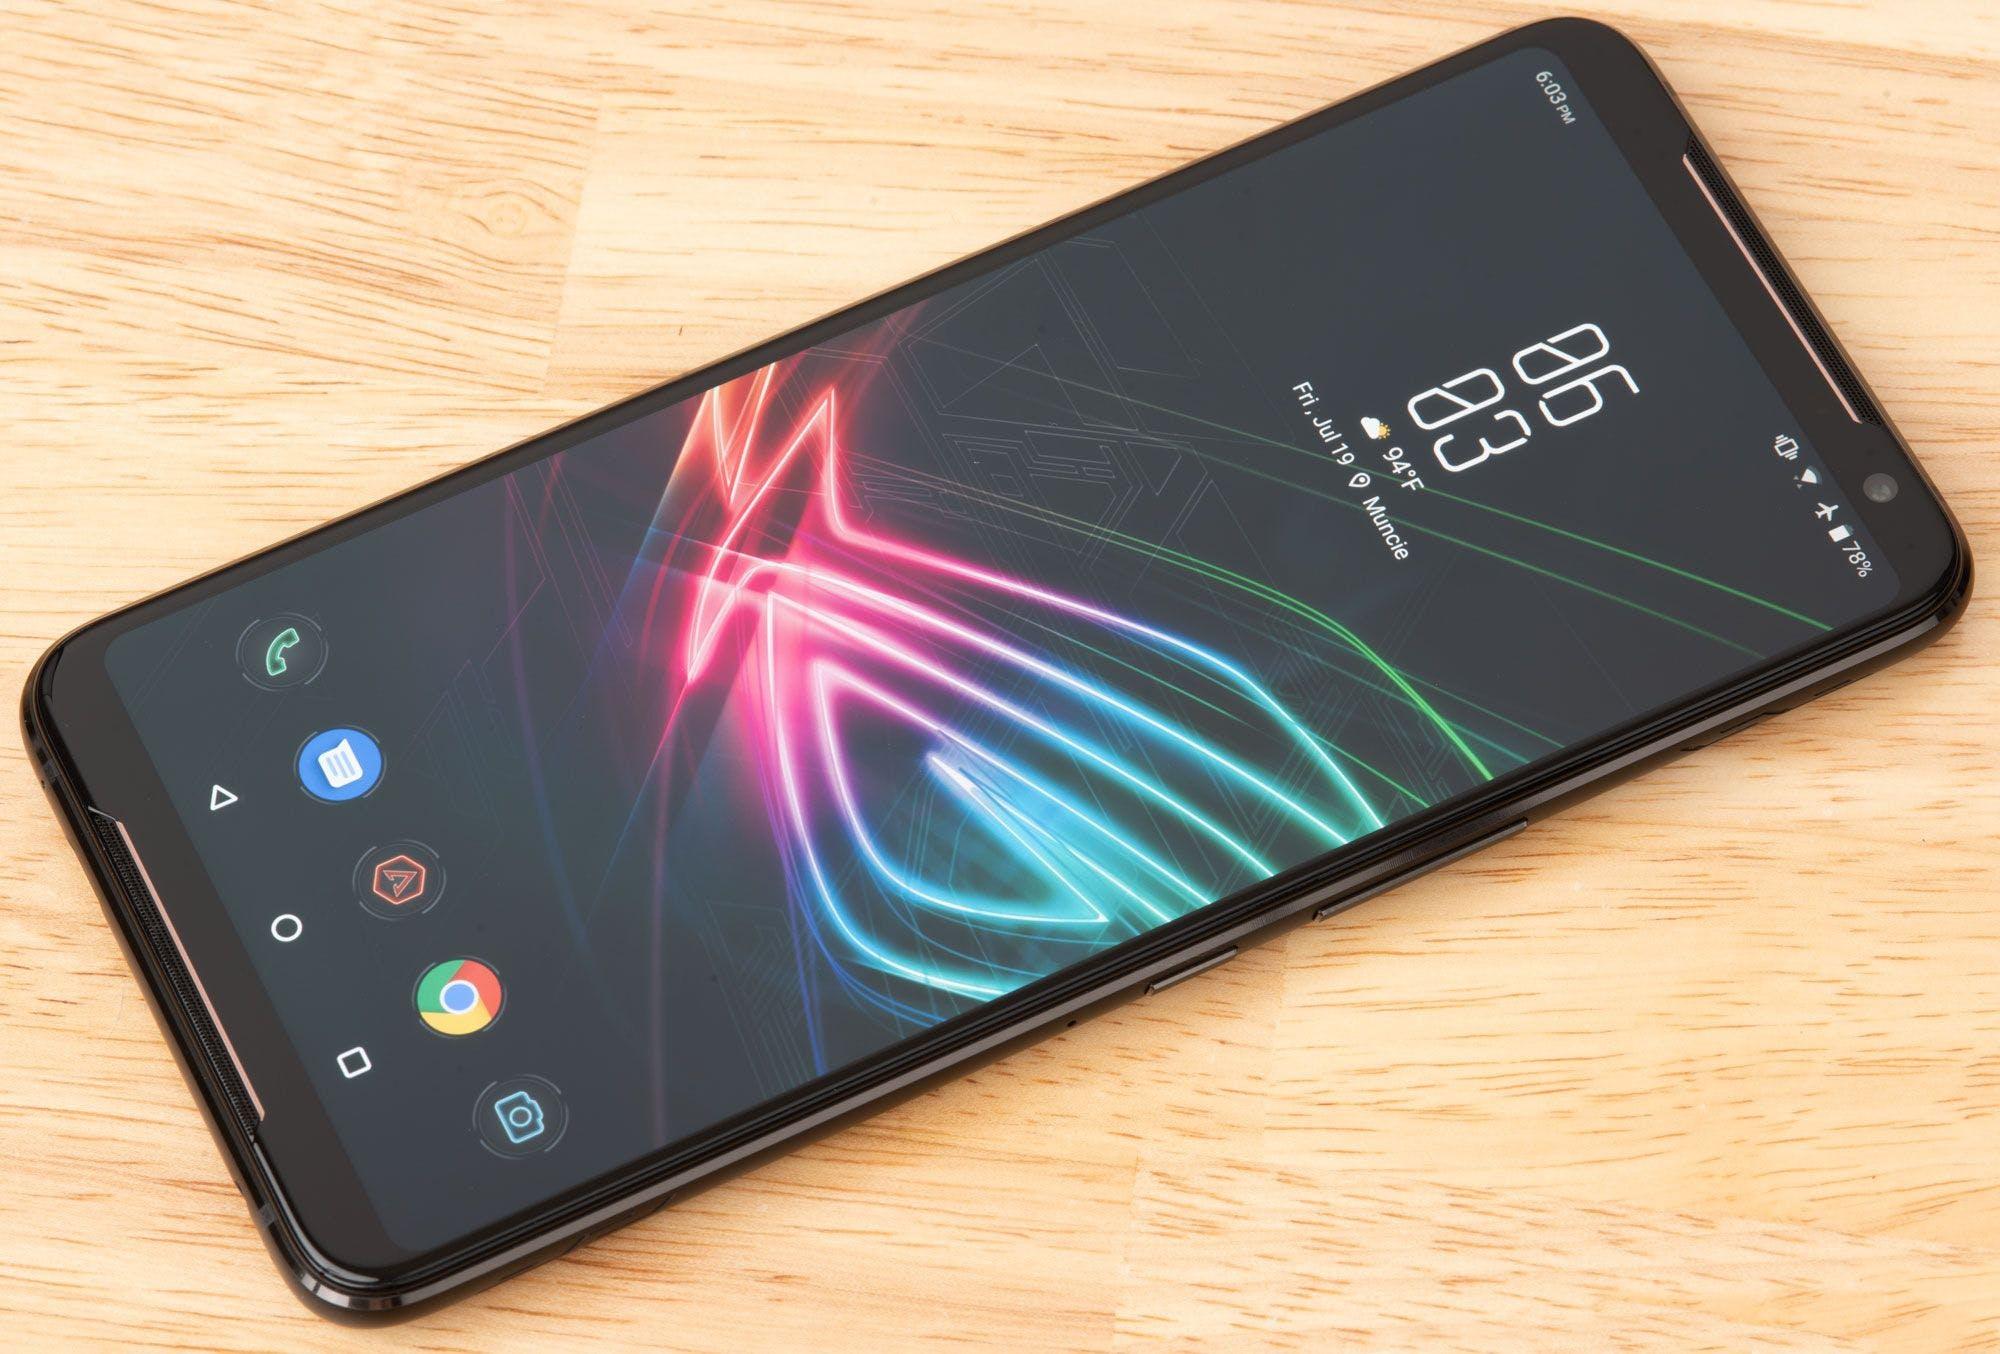 The Asus ROG Phone II has Maximum Mobile Gaming Specs